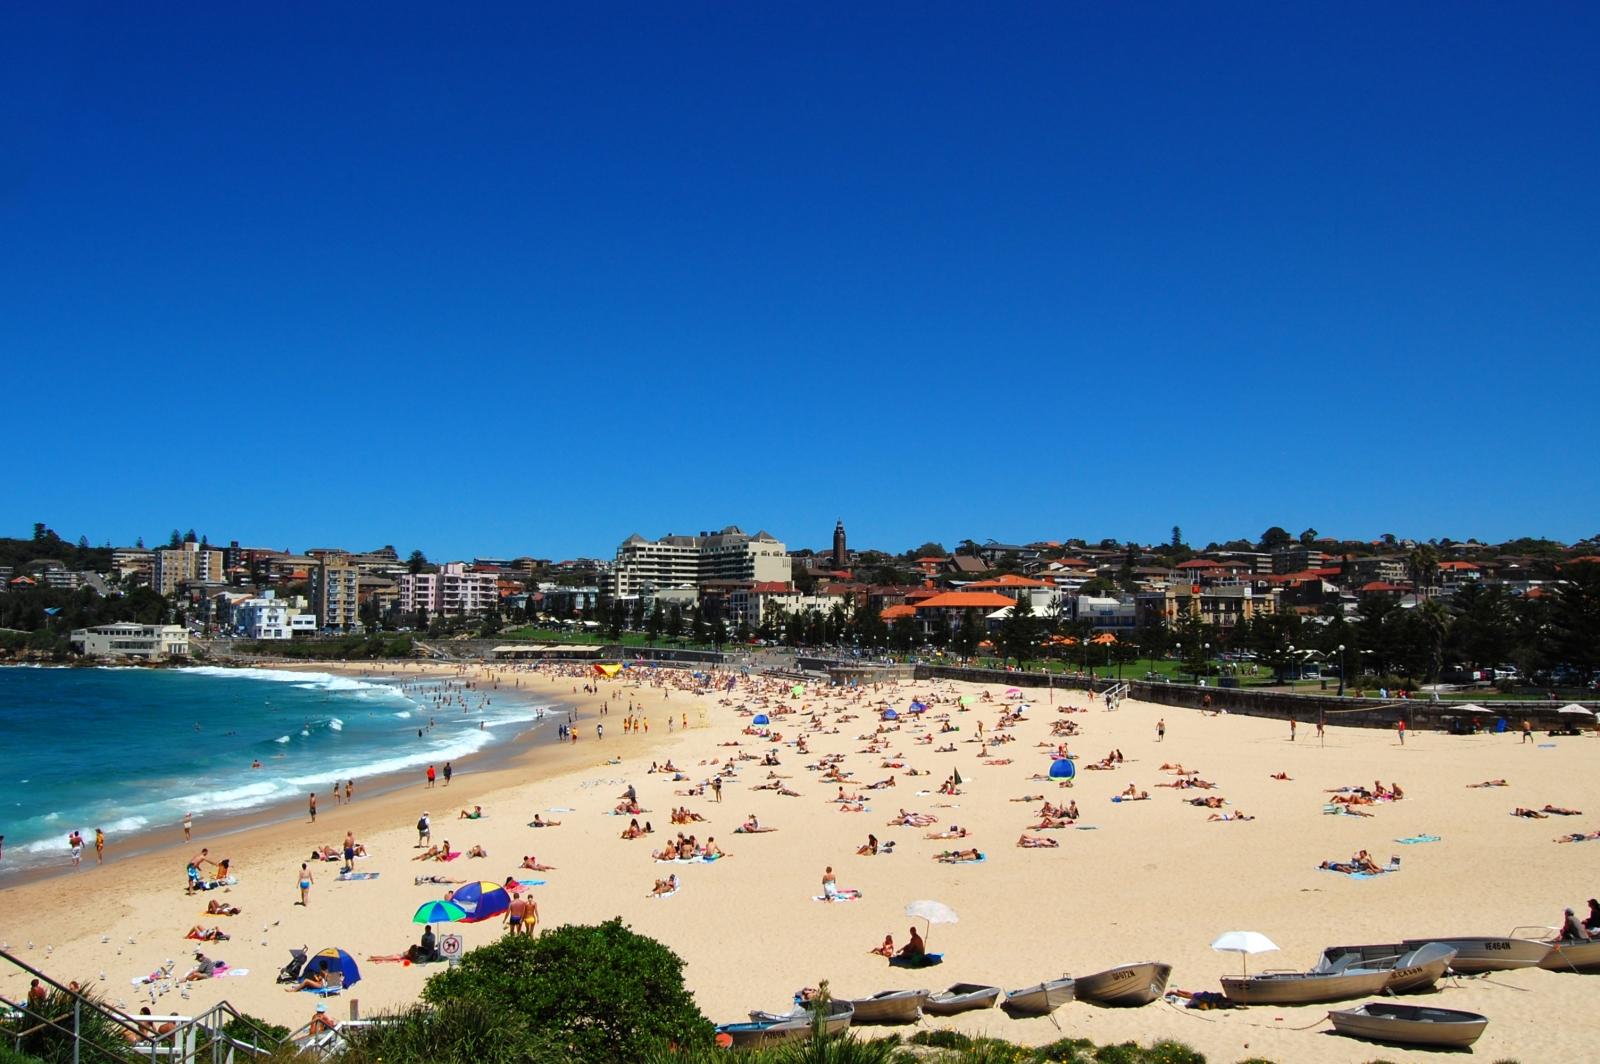 Coogee Beach in Sydney